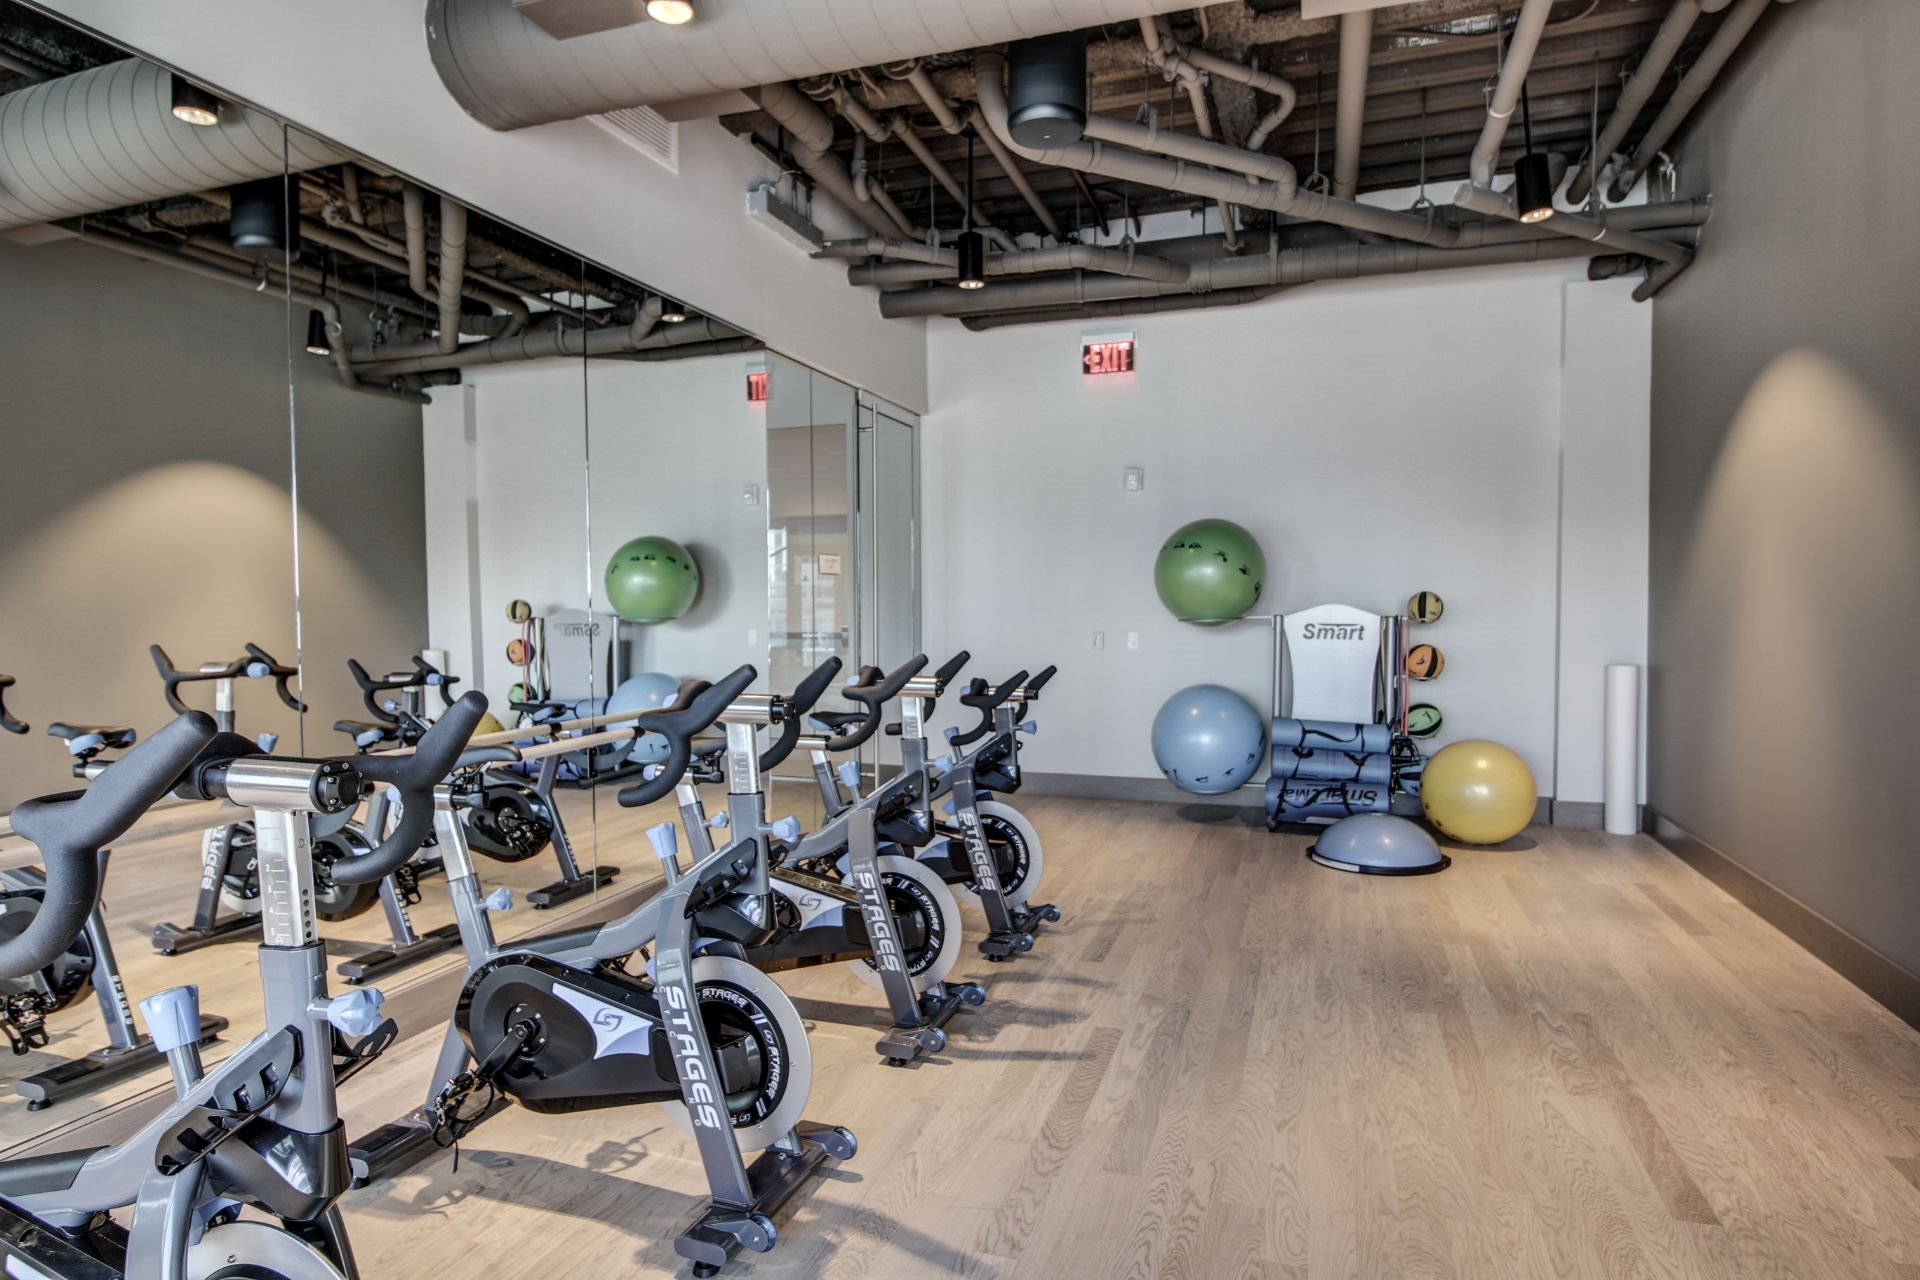 Yoga_Studio_and_TRX at Via Seaport Residences, Boston, MA, 02210